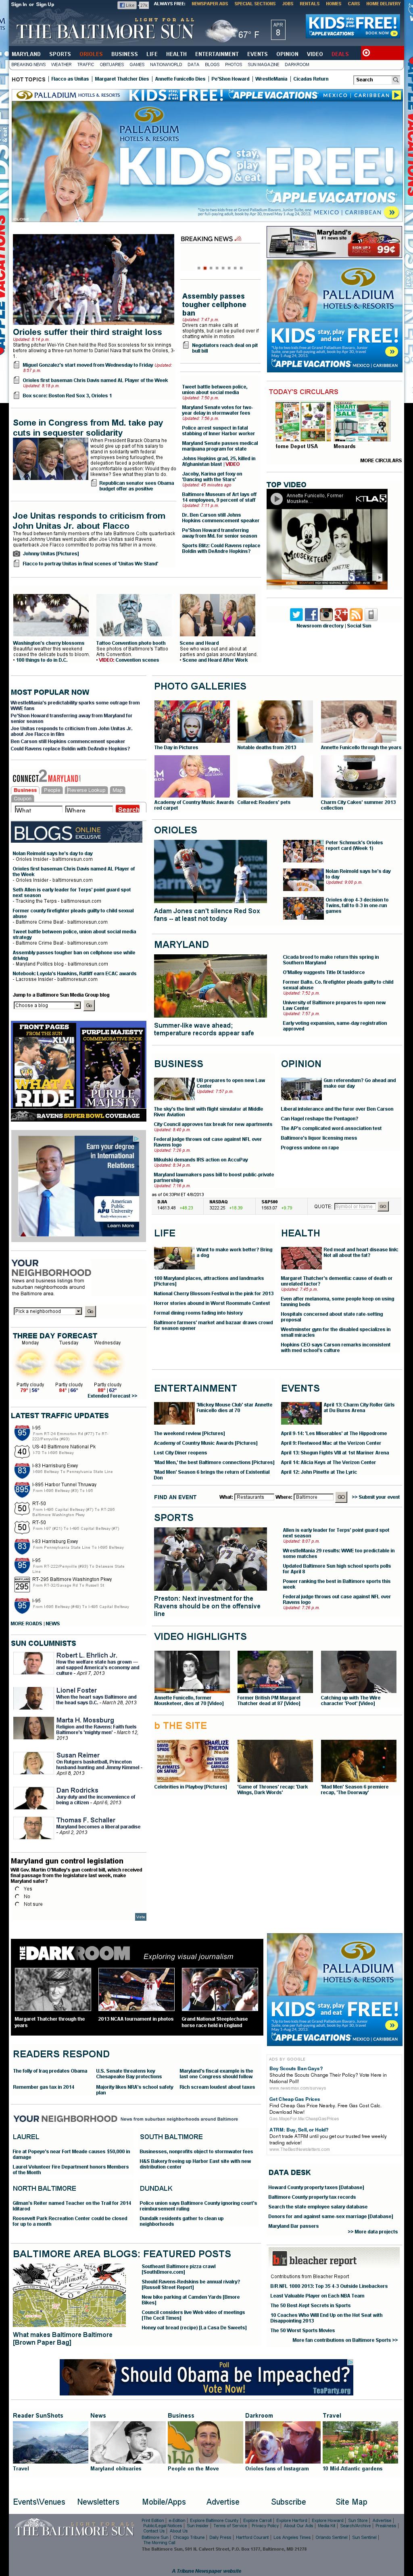 The Baltimore Sun at Tuesday April 9, 2013, 2:01 a.m. UTC